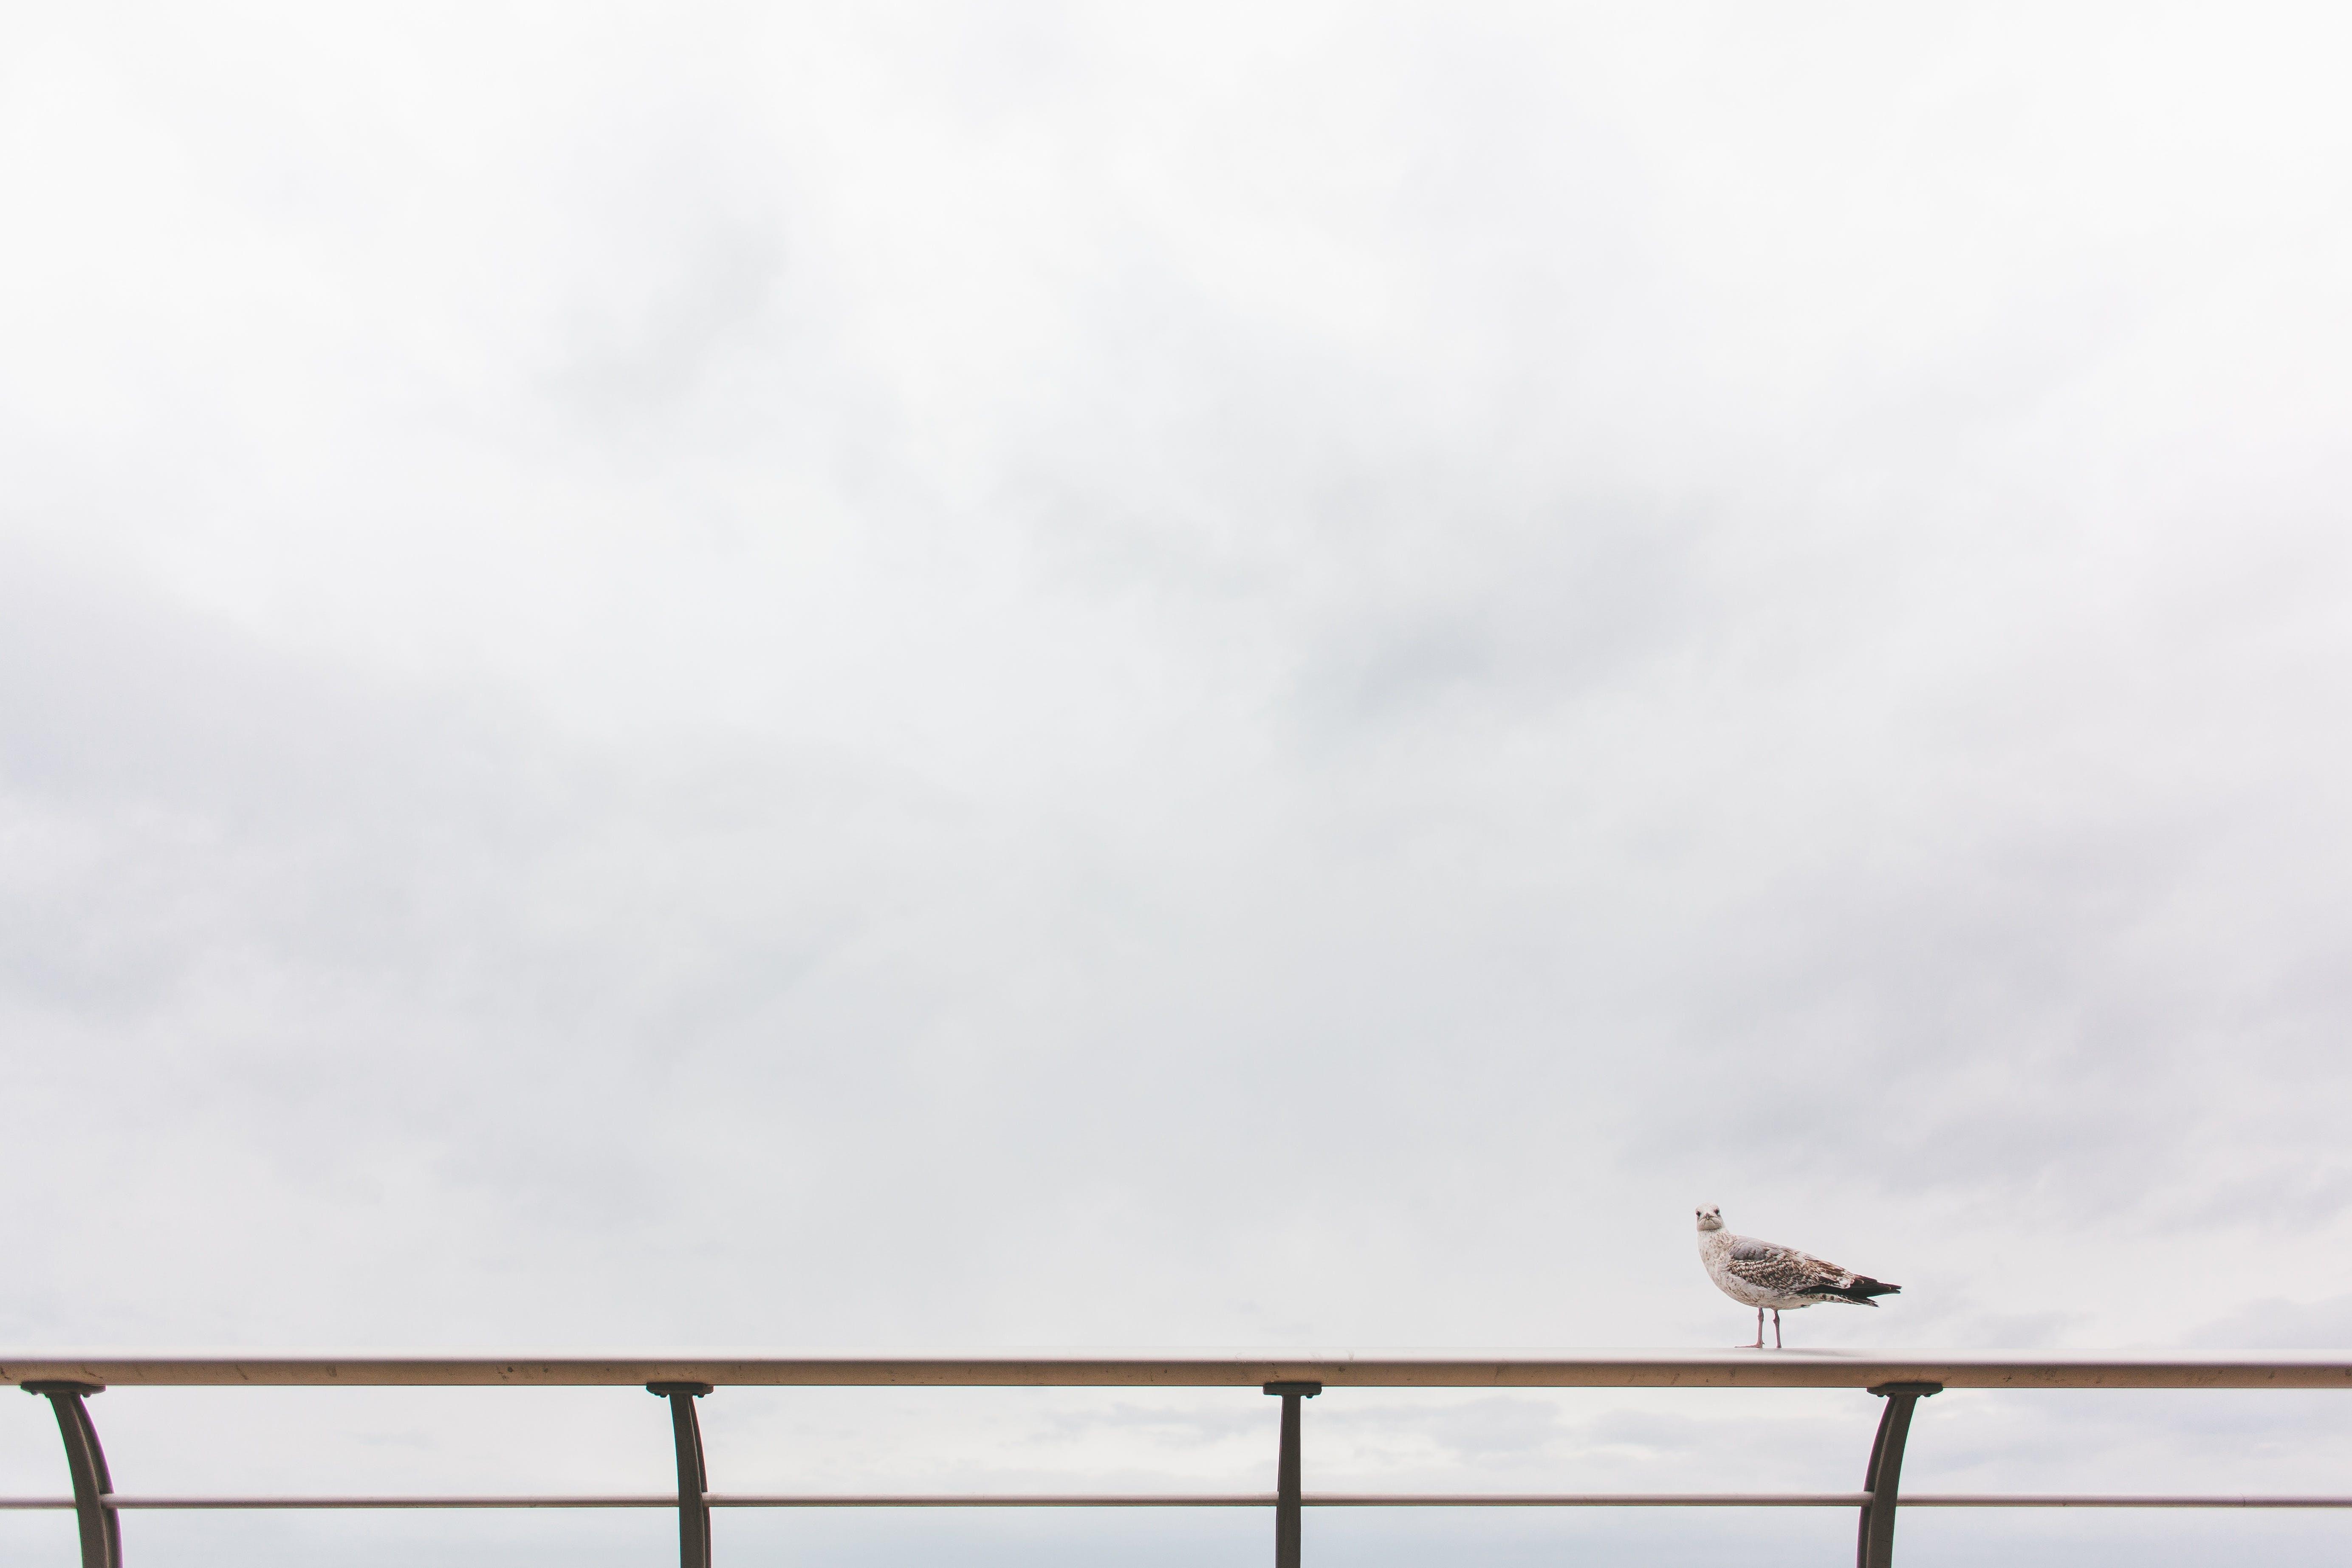 Free stock photo of nature, bird, animal, sitting